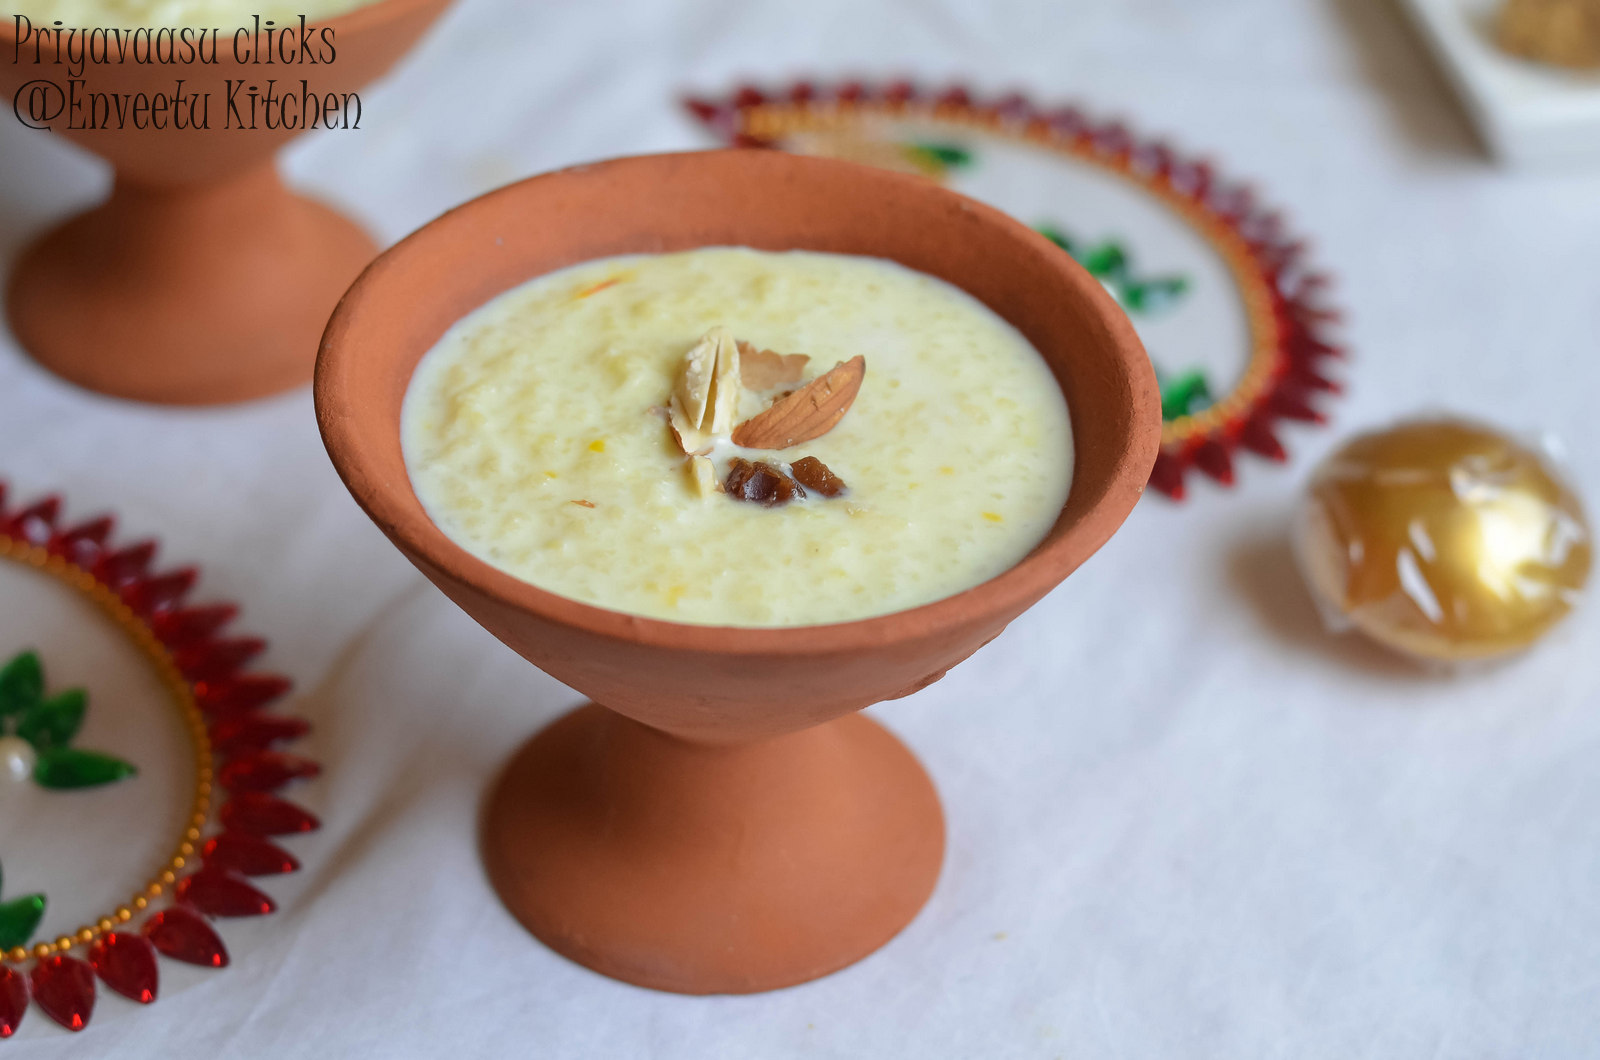 jhangore ki kheer/kuthiravaali payasam/barnyard millet kheer/pudding from uttarakhand//uttaranchal